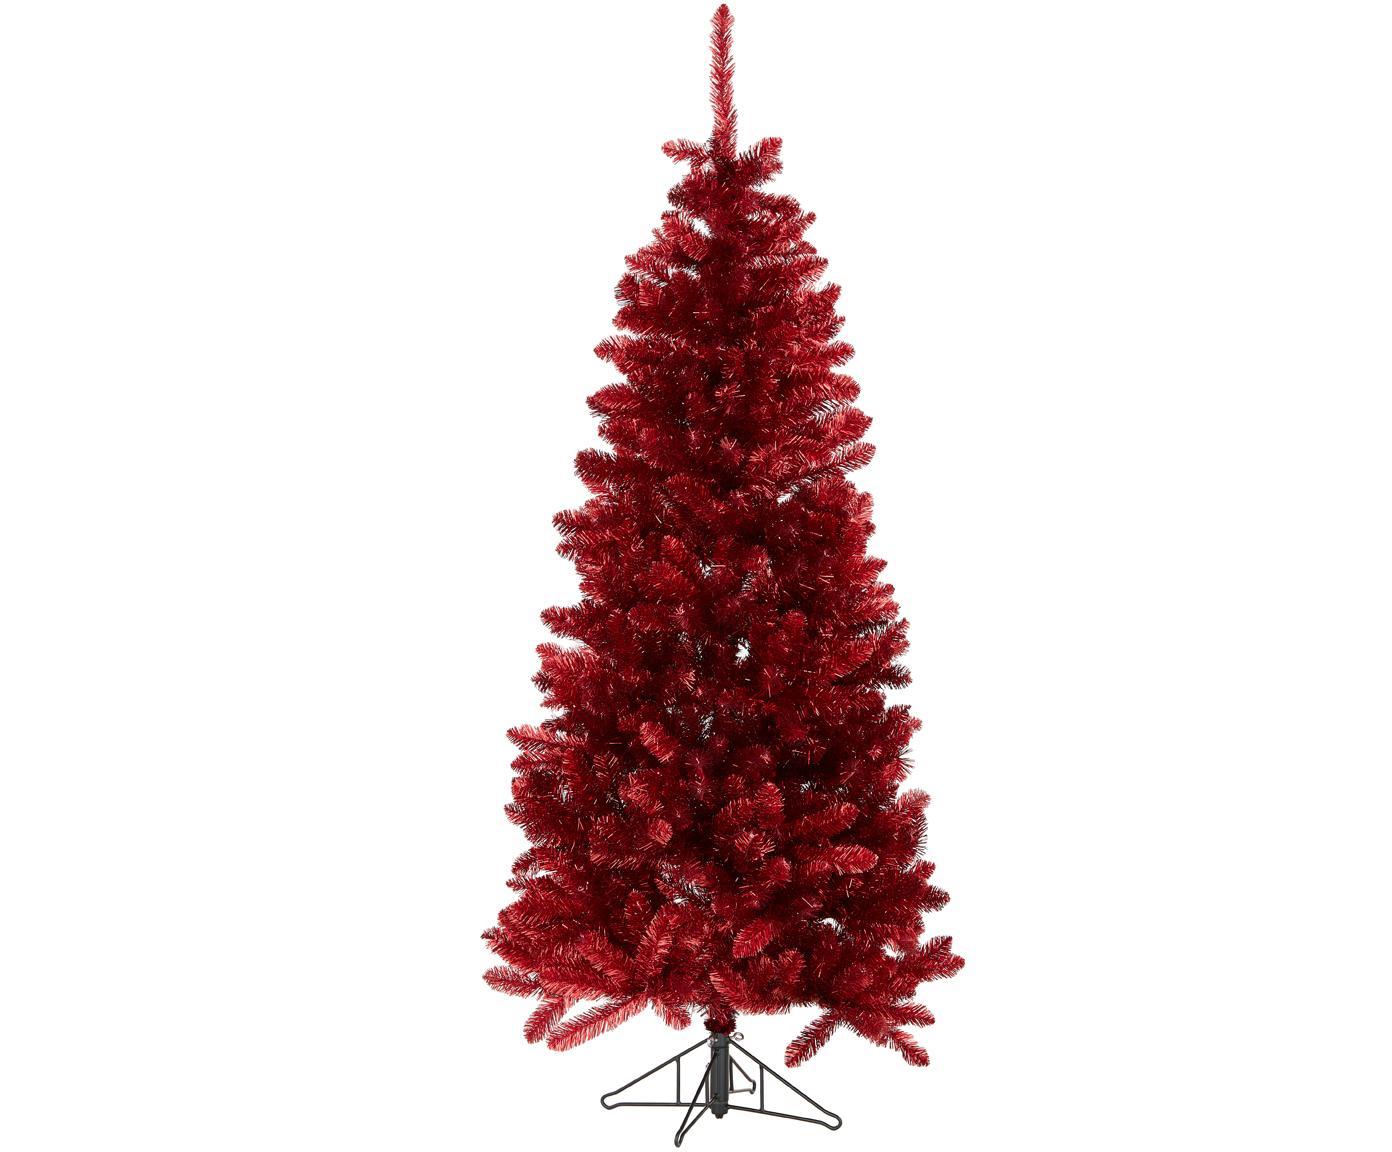 Decoratieve kerstboom Colchester, Kunststof (PVC), Rood, Ø 84 cm